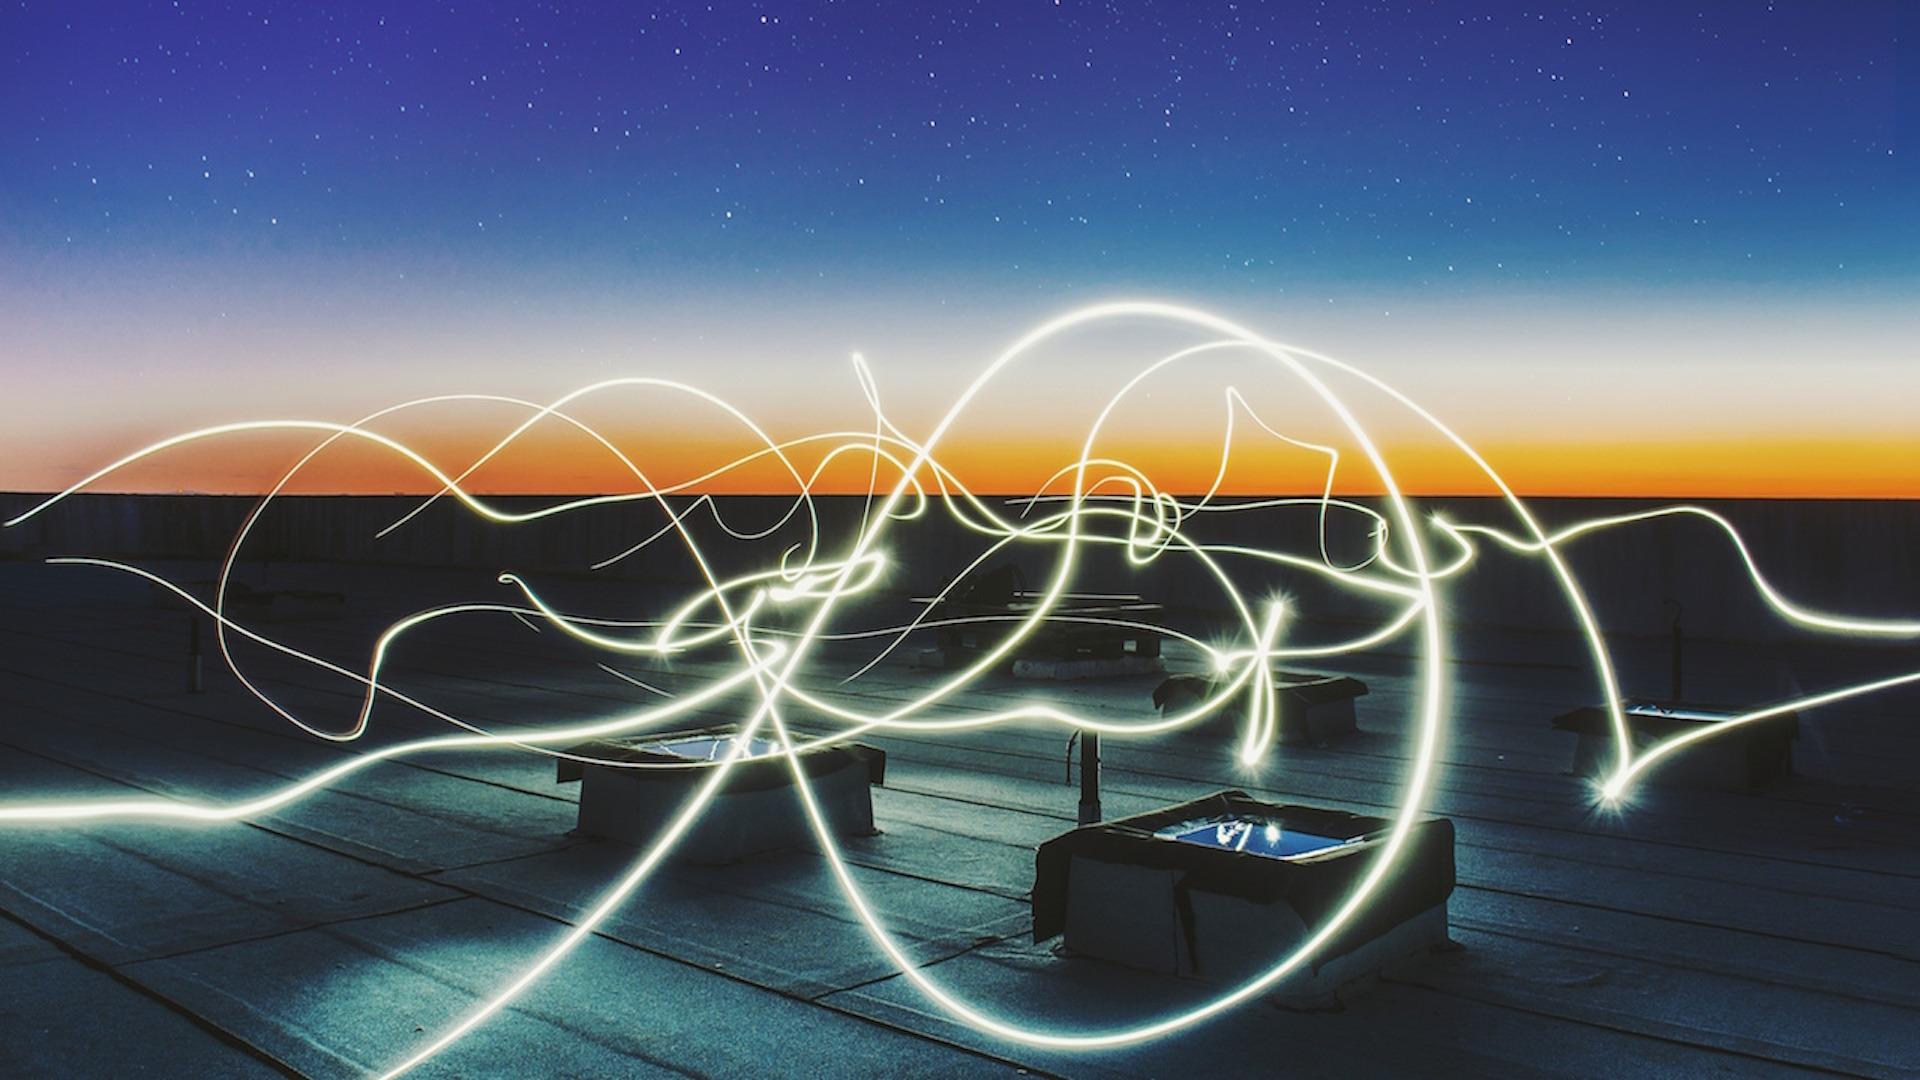 Laser trails at night image Bristol content Marketing